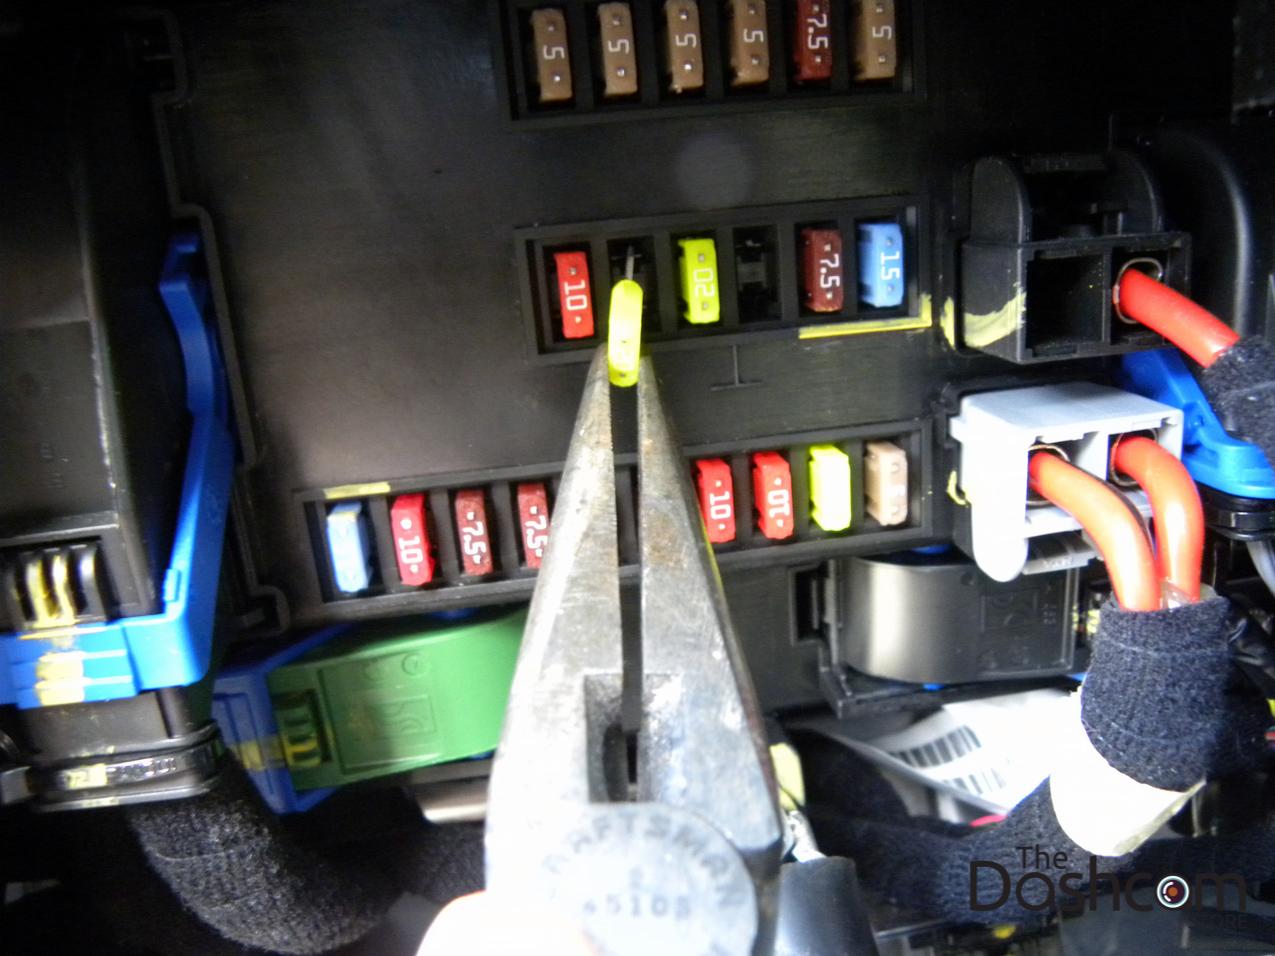 2015 dodge ram promaster blackvue dr650gw-2ch dashcam ... 2015 dodge ram 2500 fuse box diagram